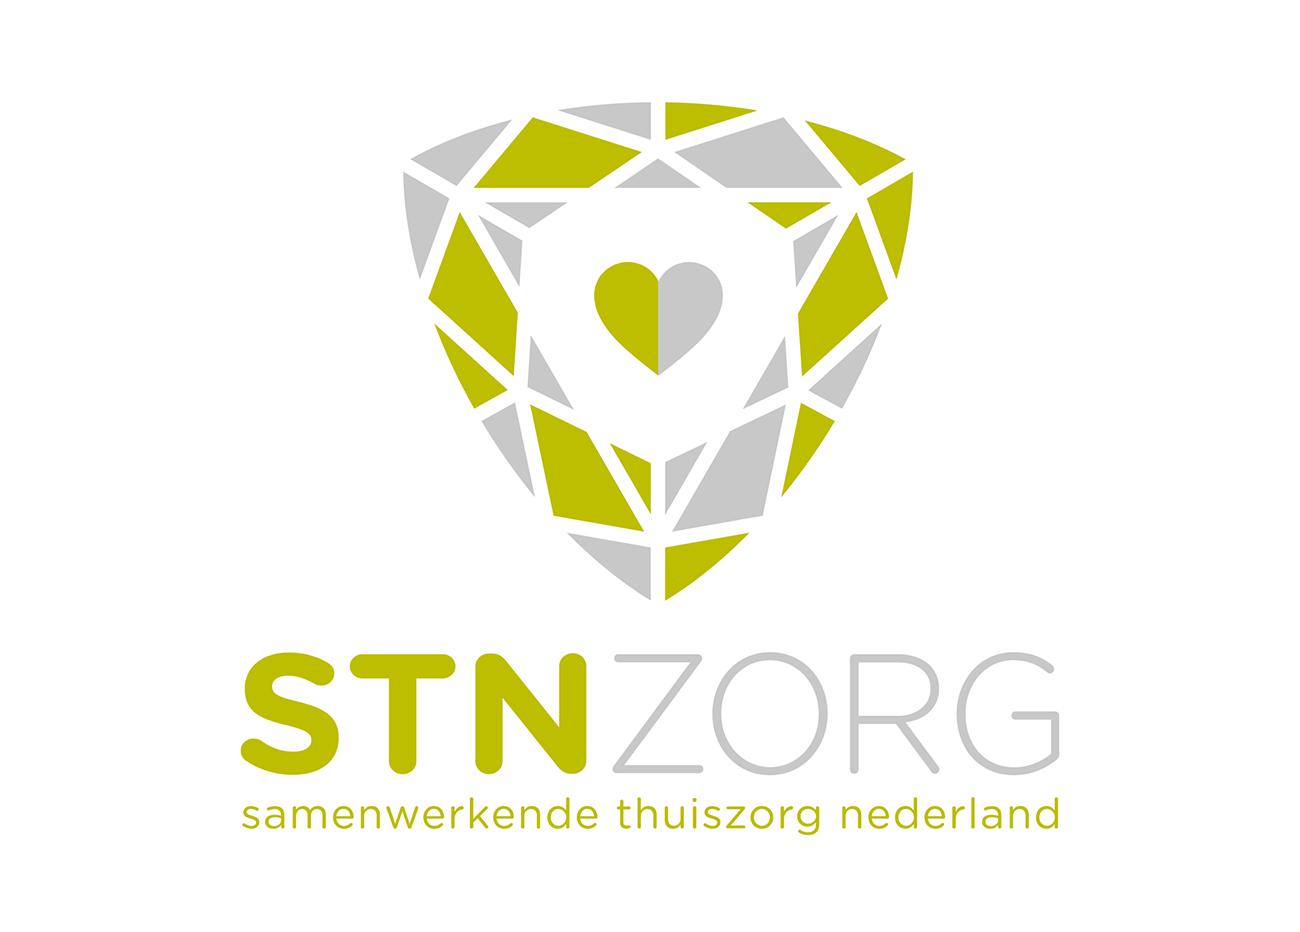 Logo-STN-Zorg_pms